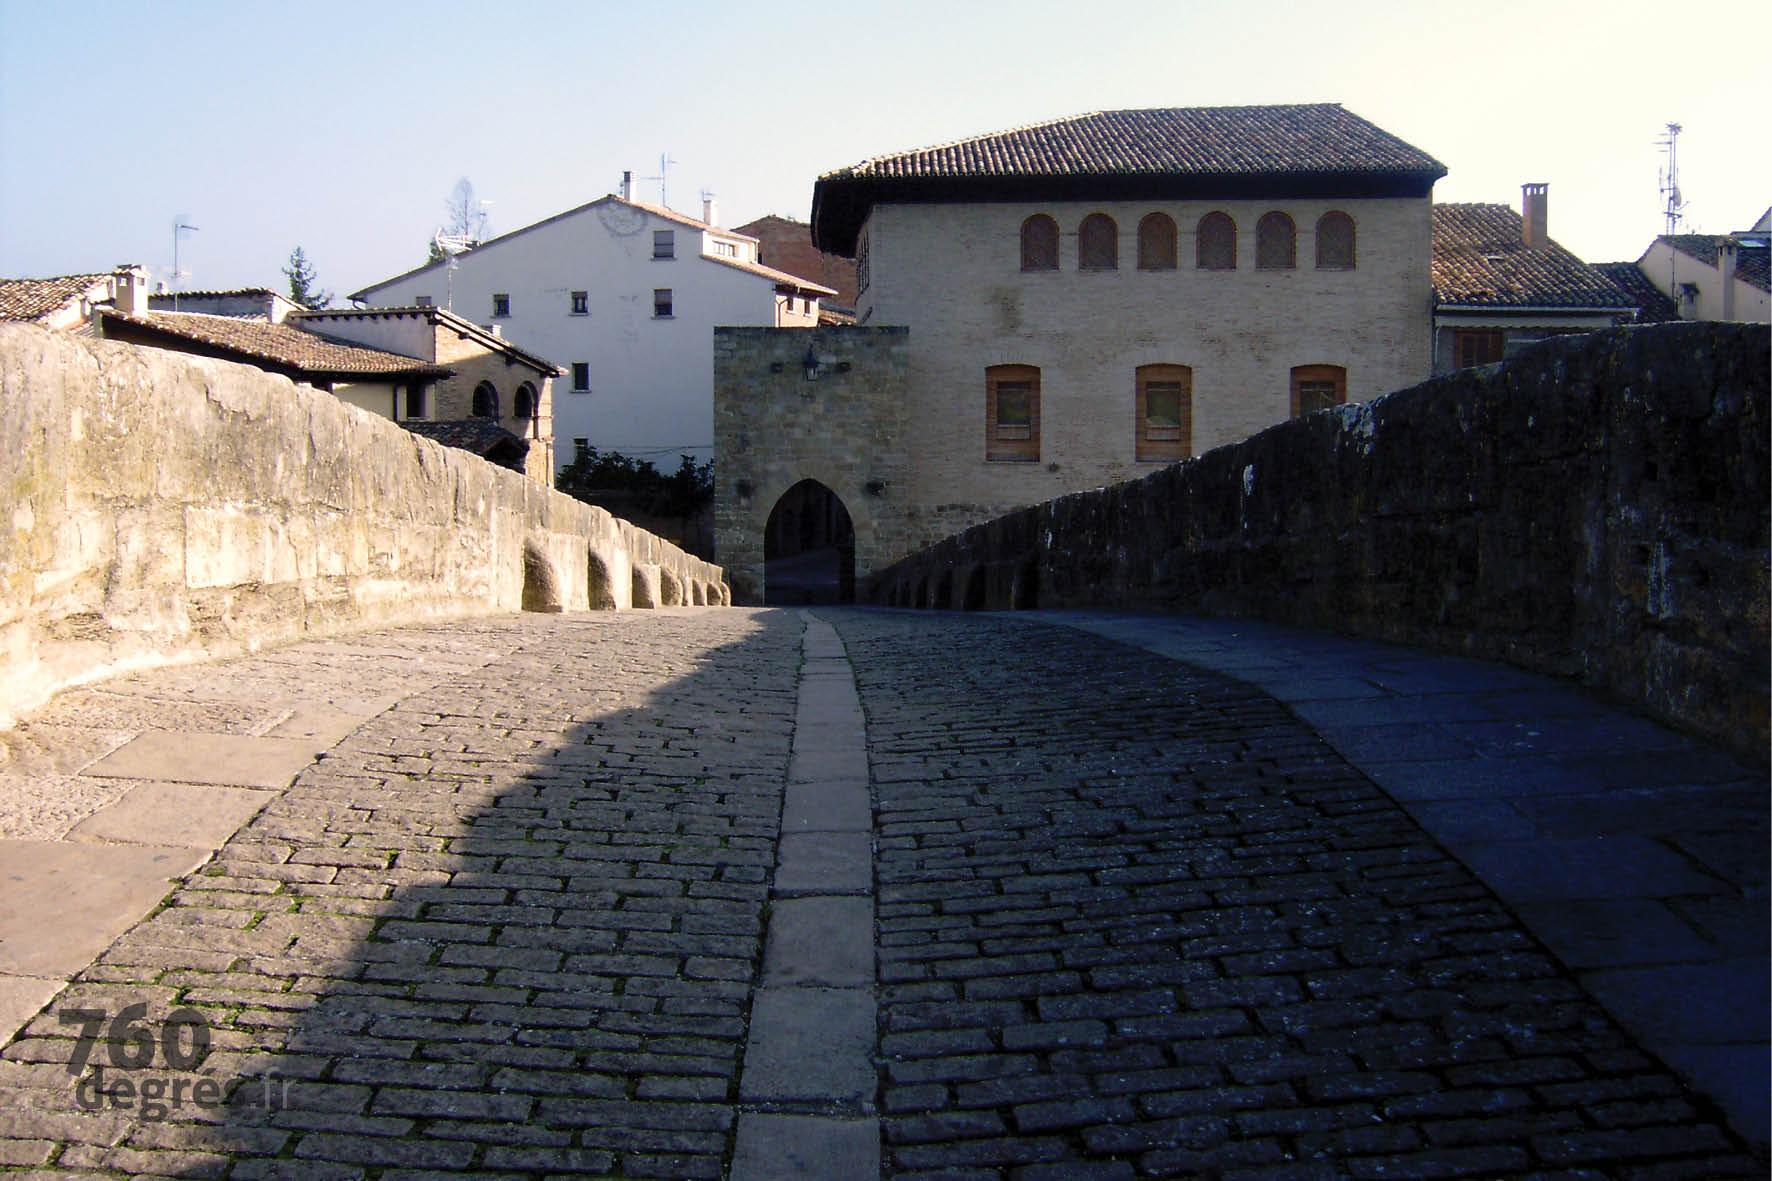 760degres-pays-basque-puente-la-reina-02